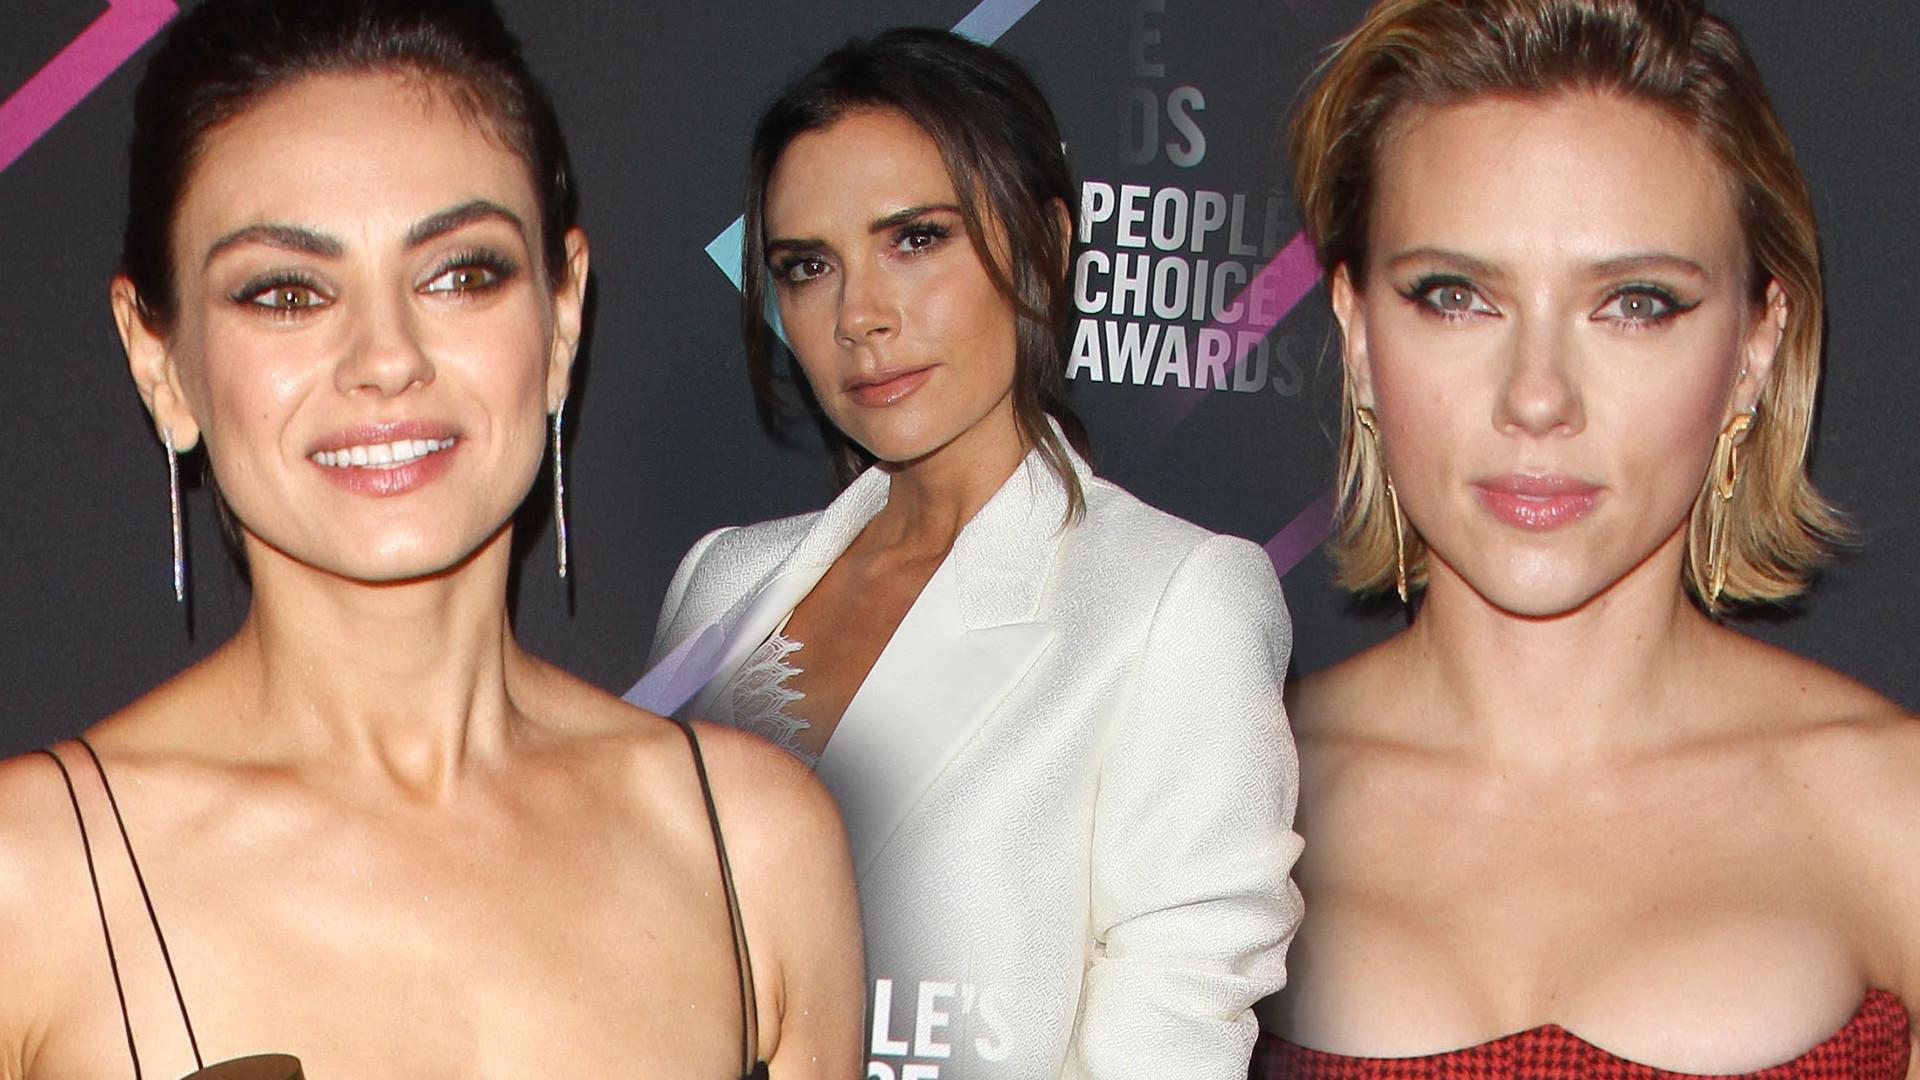 Gwiazdy na gali People's Choice Awards 2018